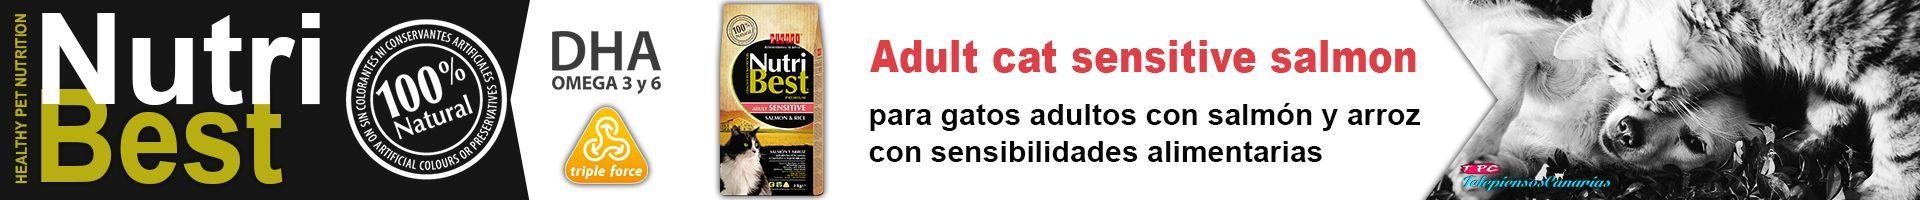 Nutribest cat adult sensitive, pienso de salmón para gatos